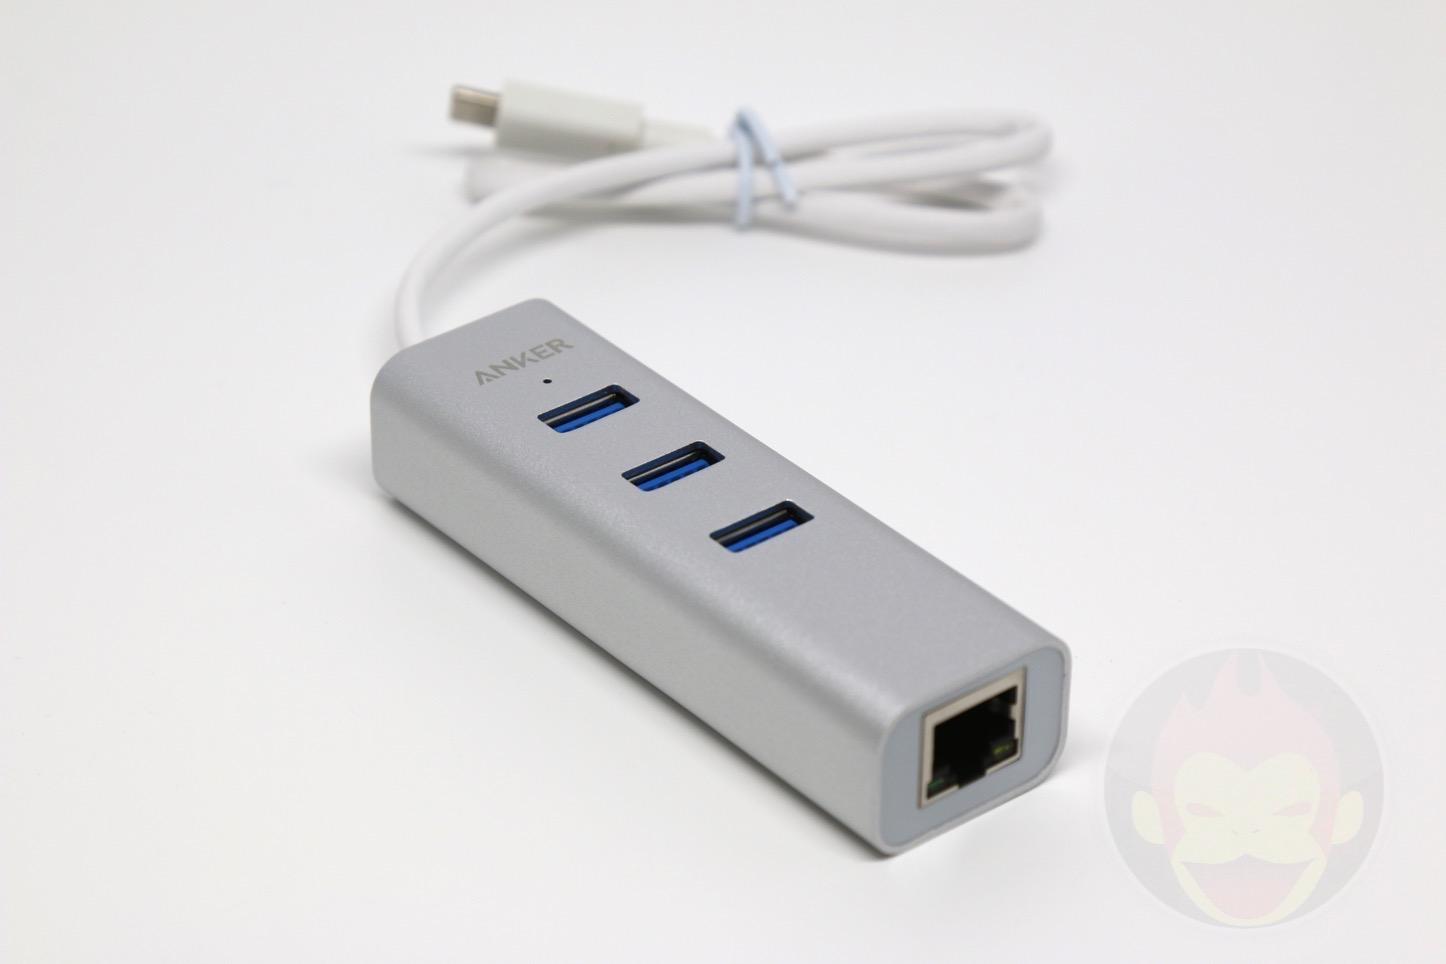 Anker-USB-C-Ethernet-Cable-03.jpg